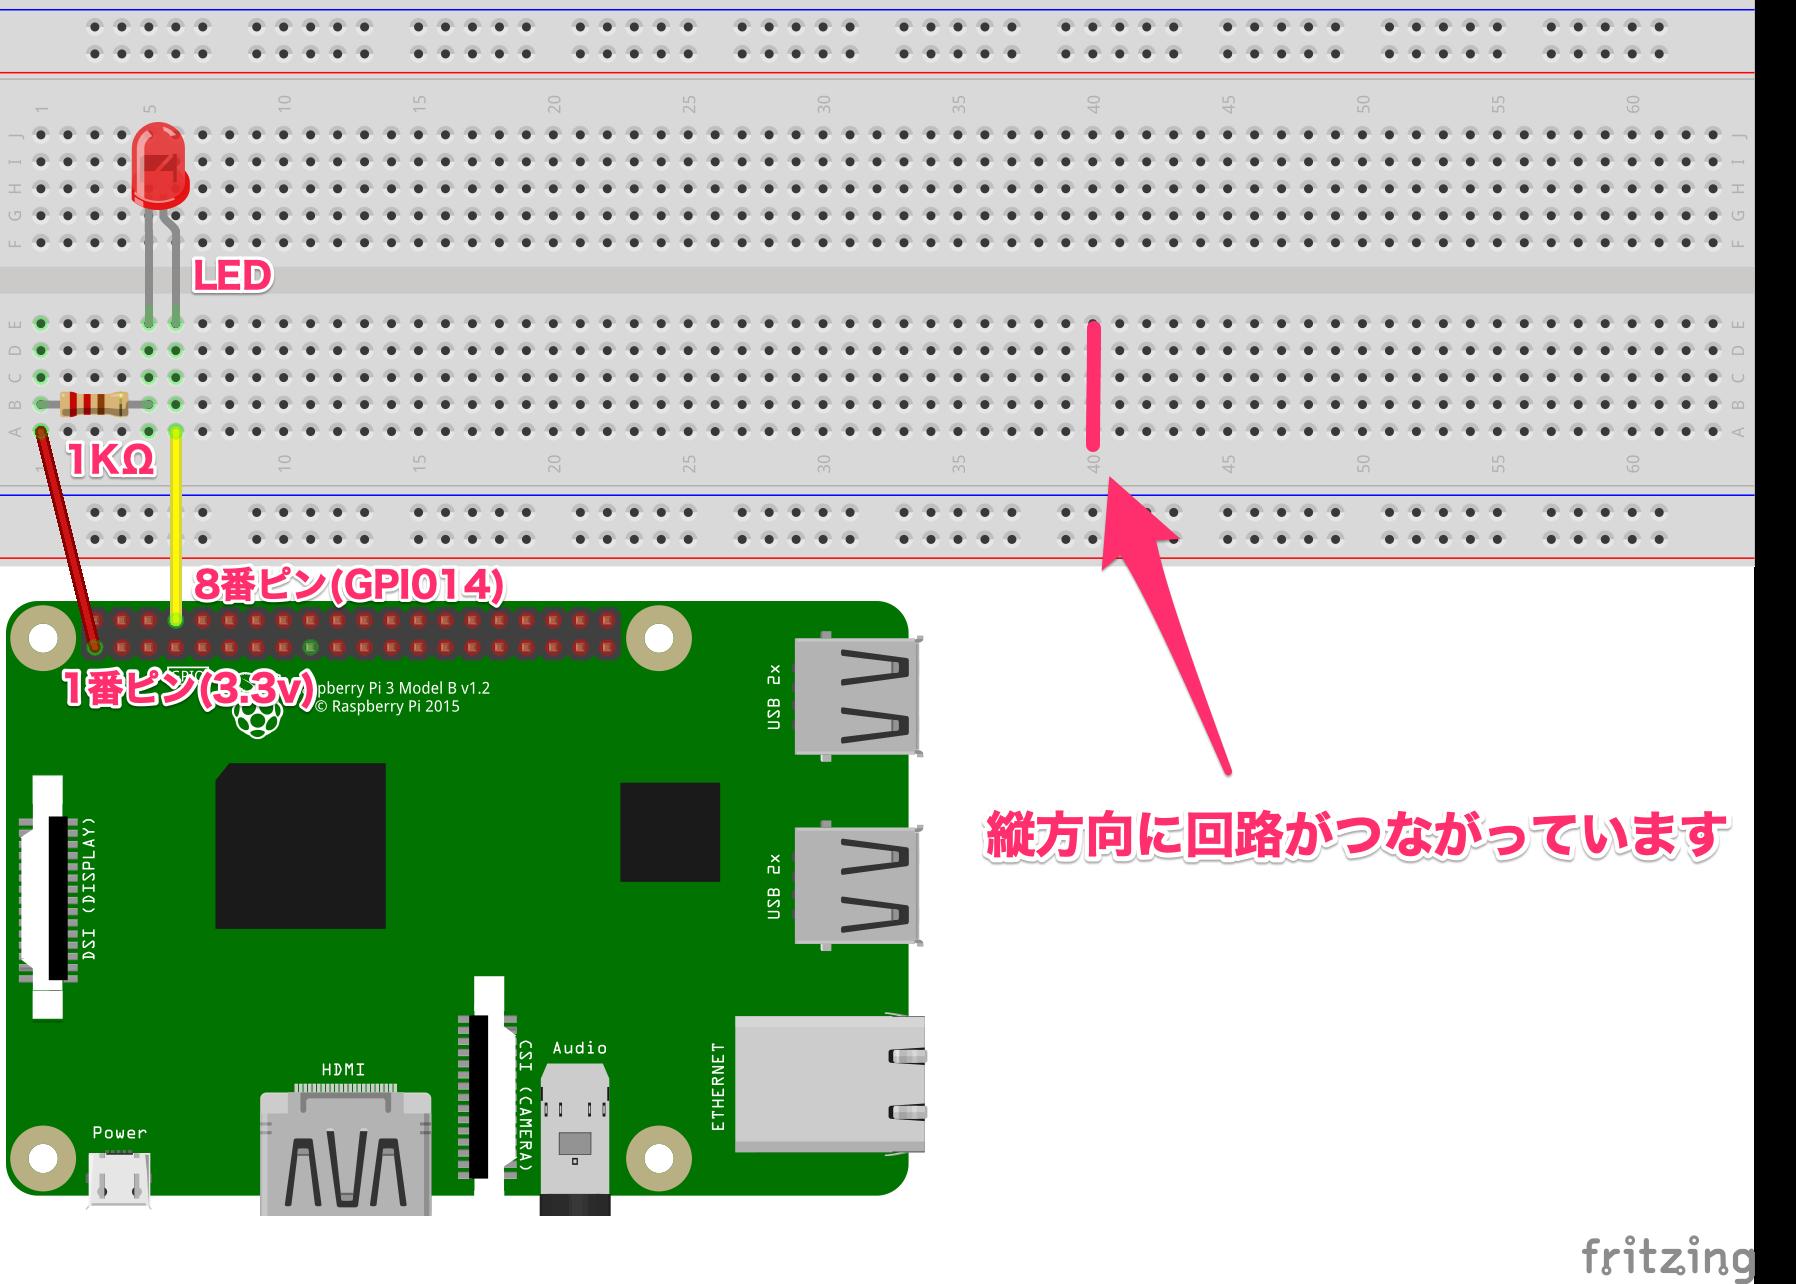 Raspberry Pi ブレッドボード 配線